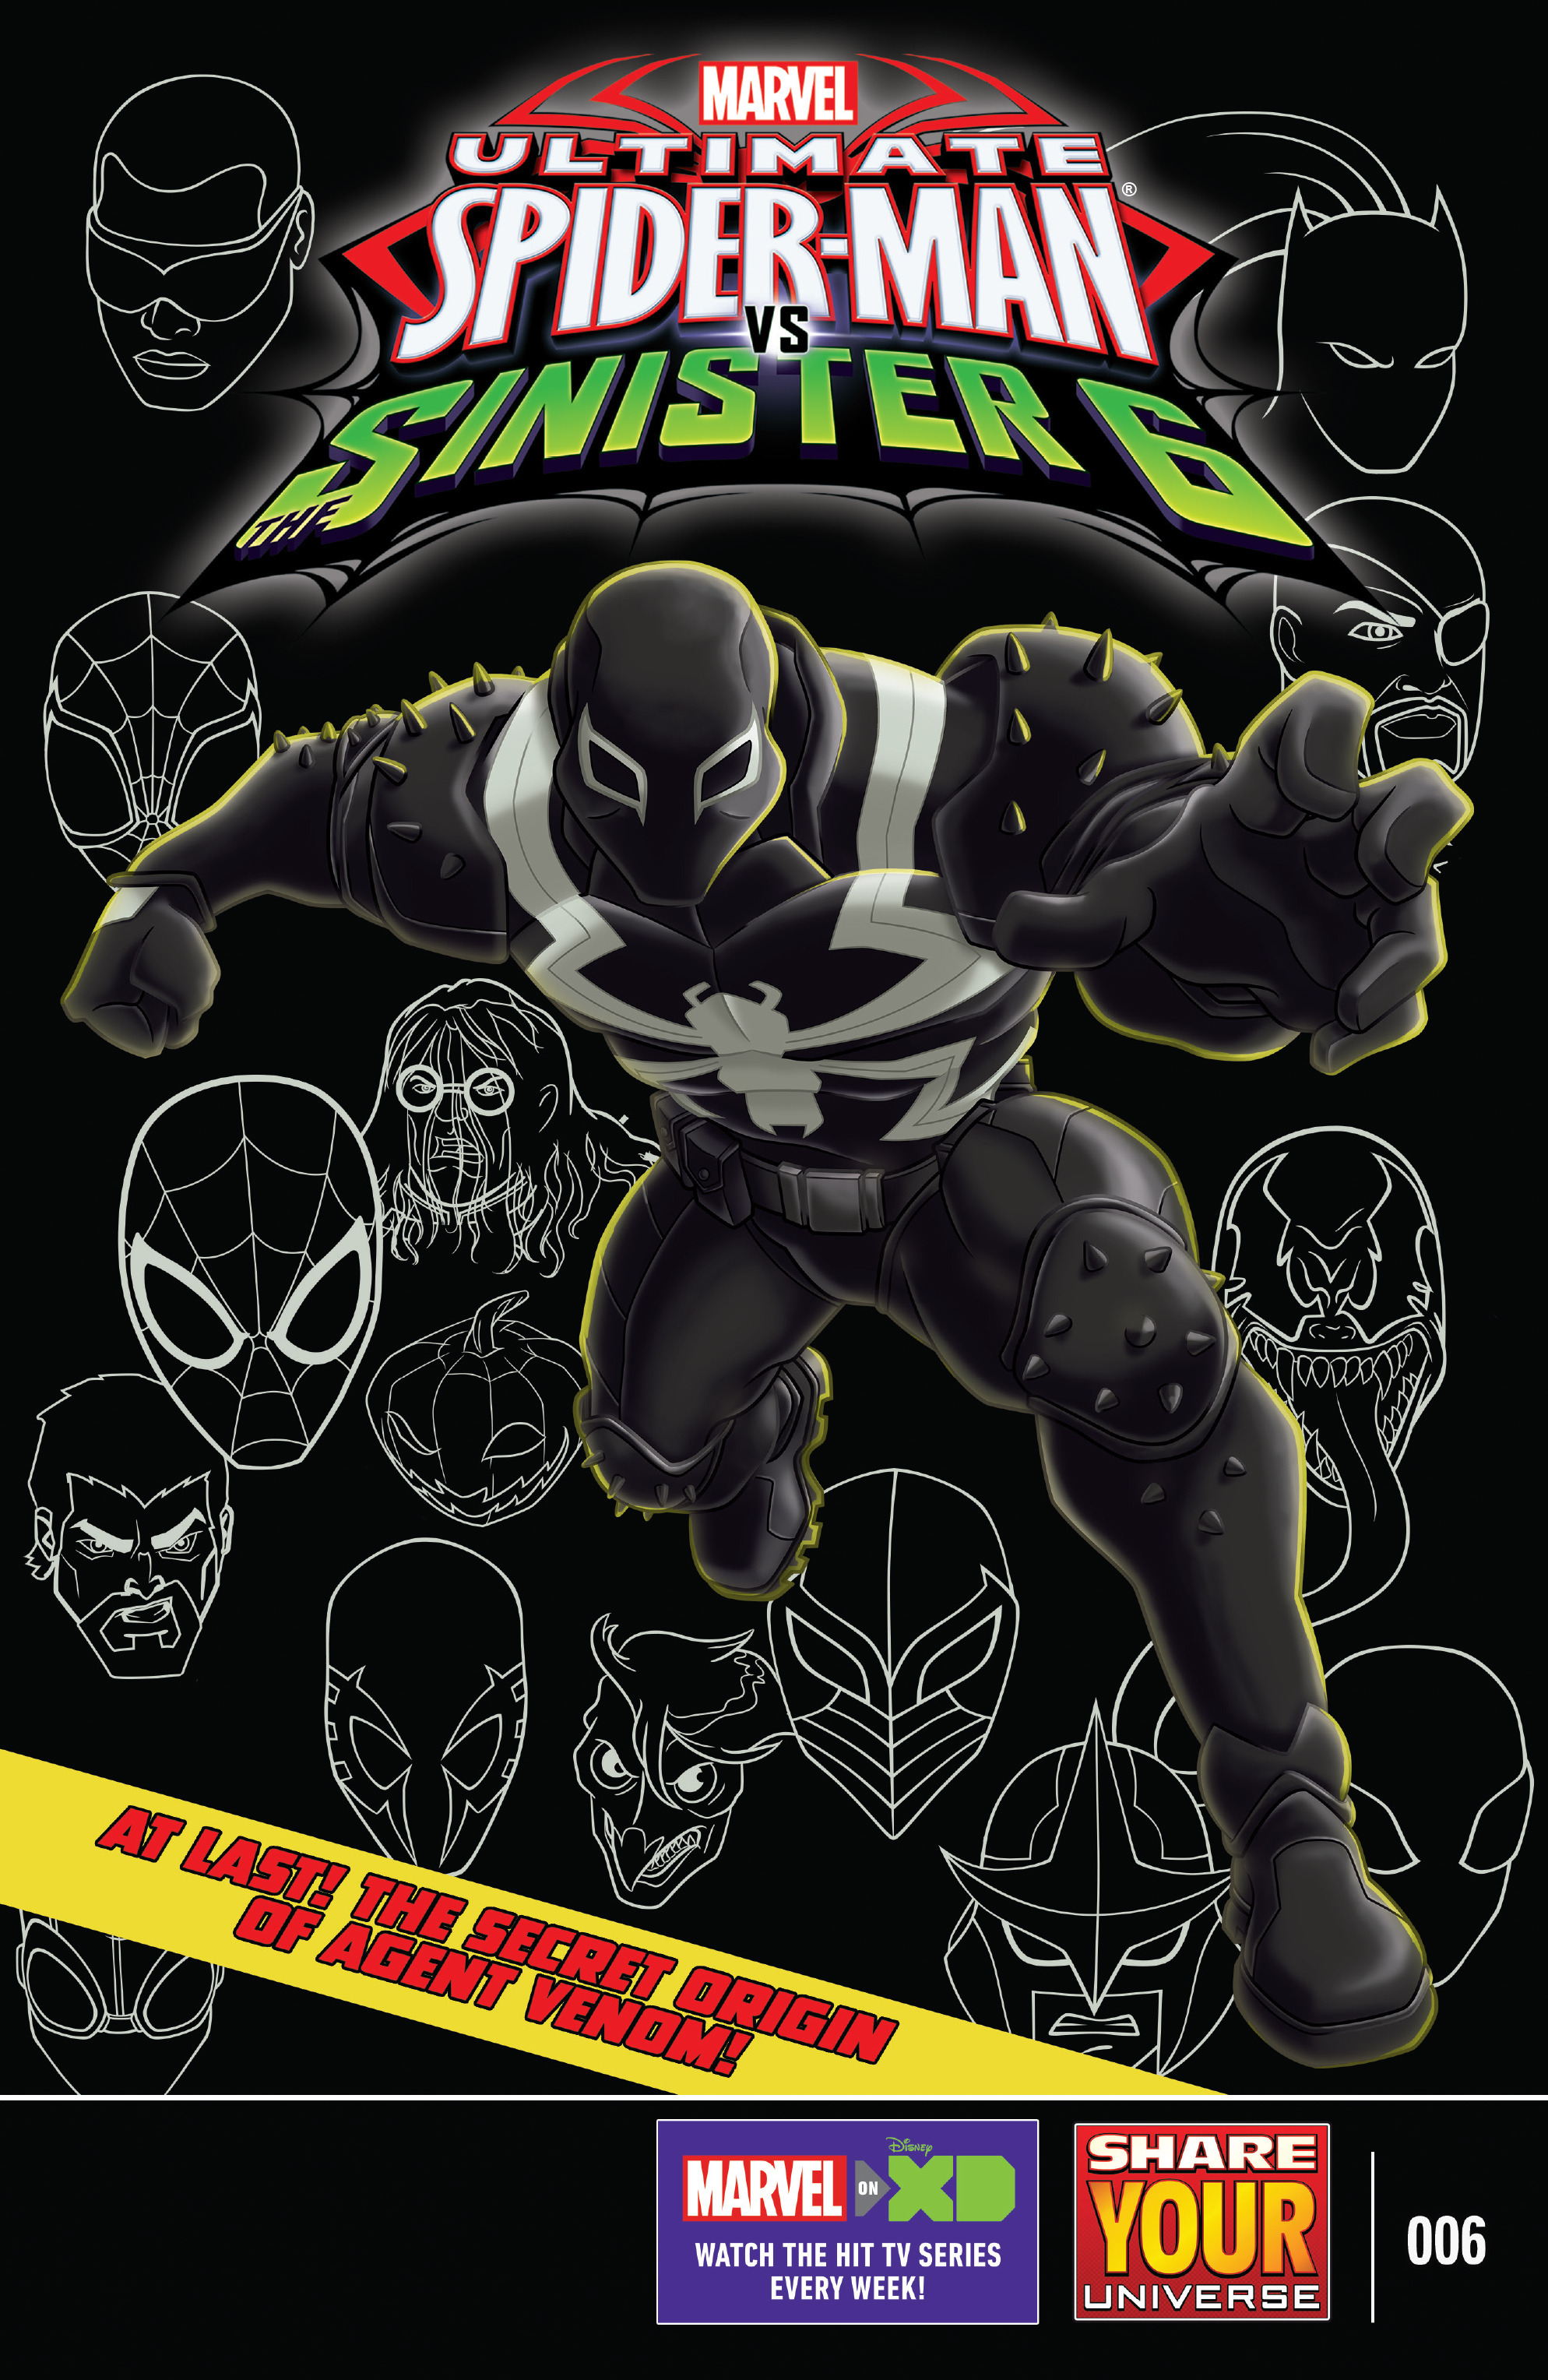 marvel universe: ultimate spider-man vs the sinister 6 - agent venom